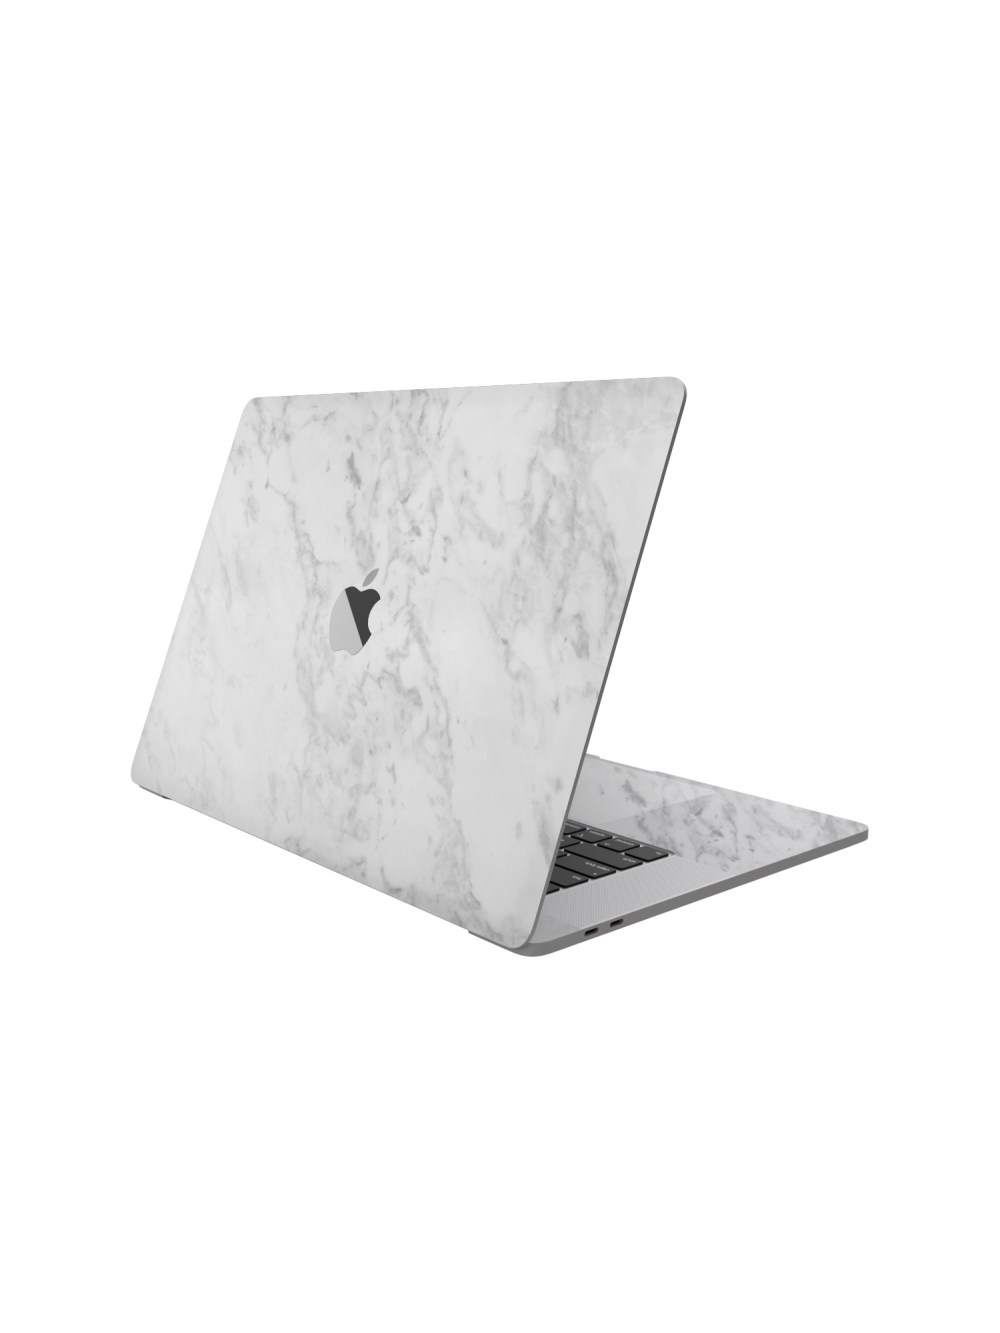 White Marble Skin for Apple Macbook Pro M1 2020